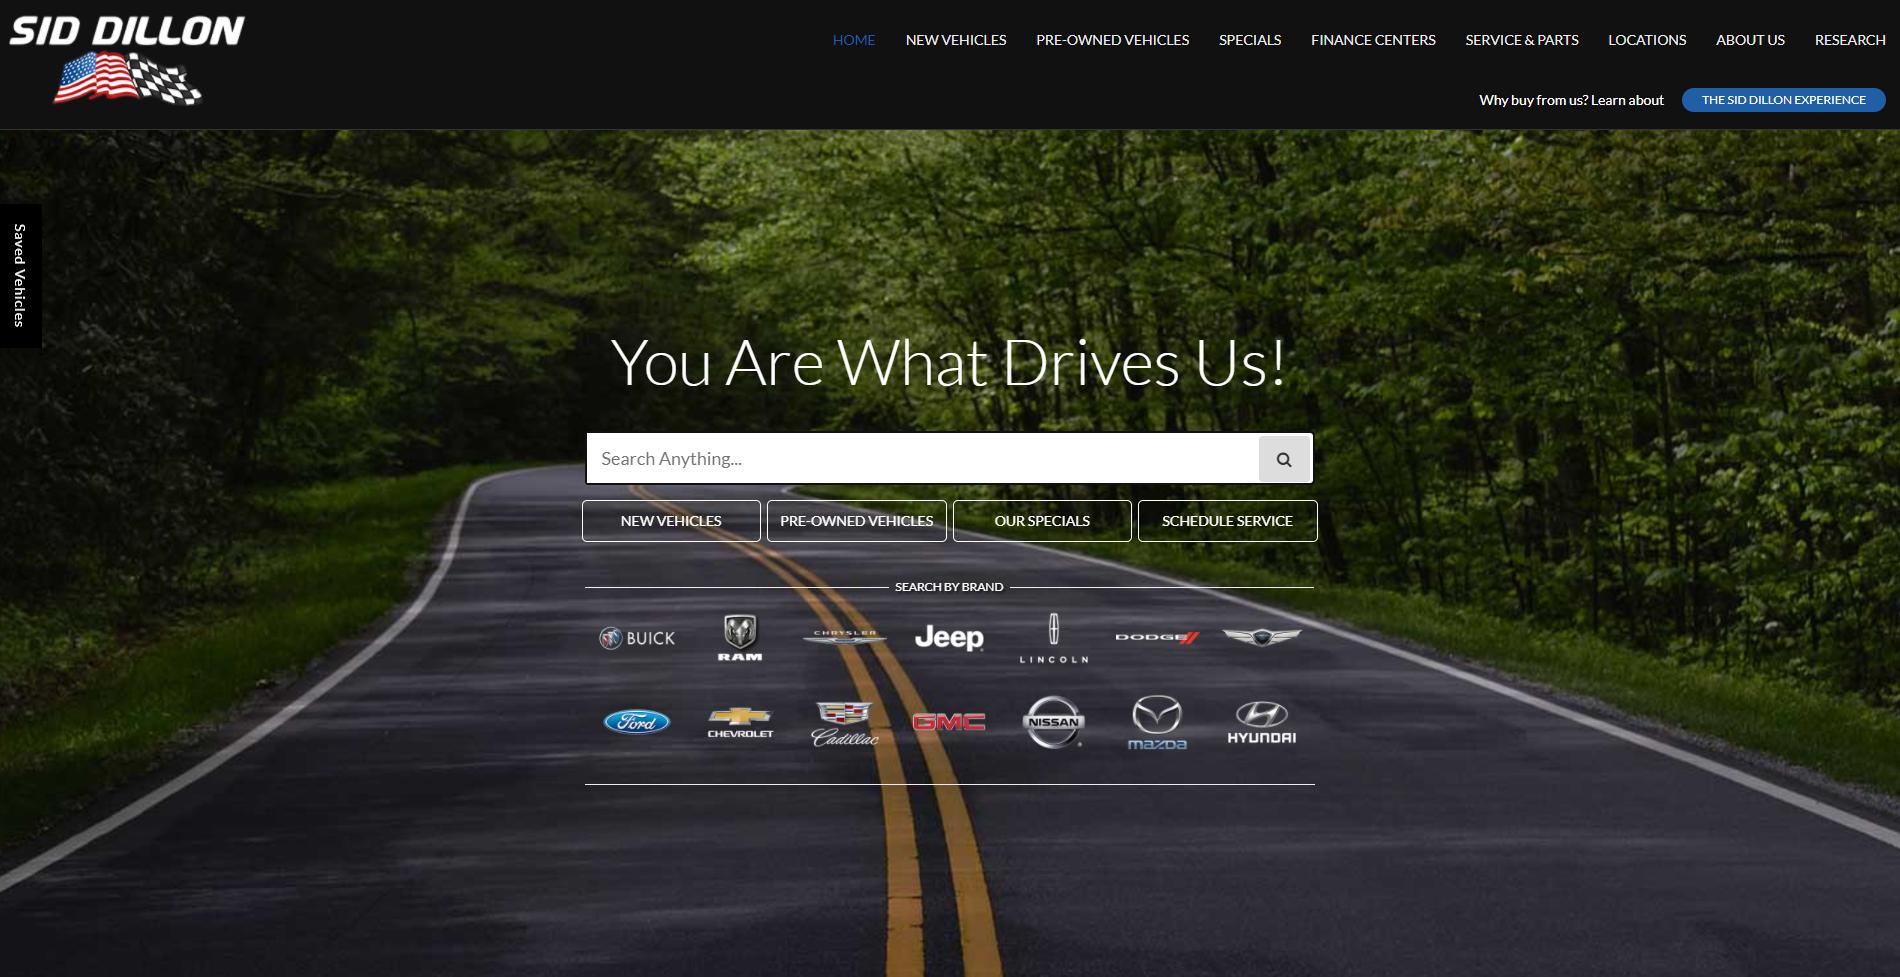 Car Dealerships Lincoln Ne >> Sid Dillon Auto Group | New & Used Car Dealers Nebraska